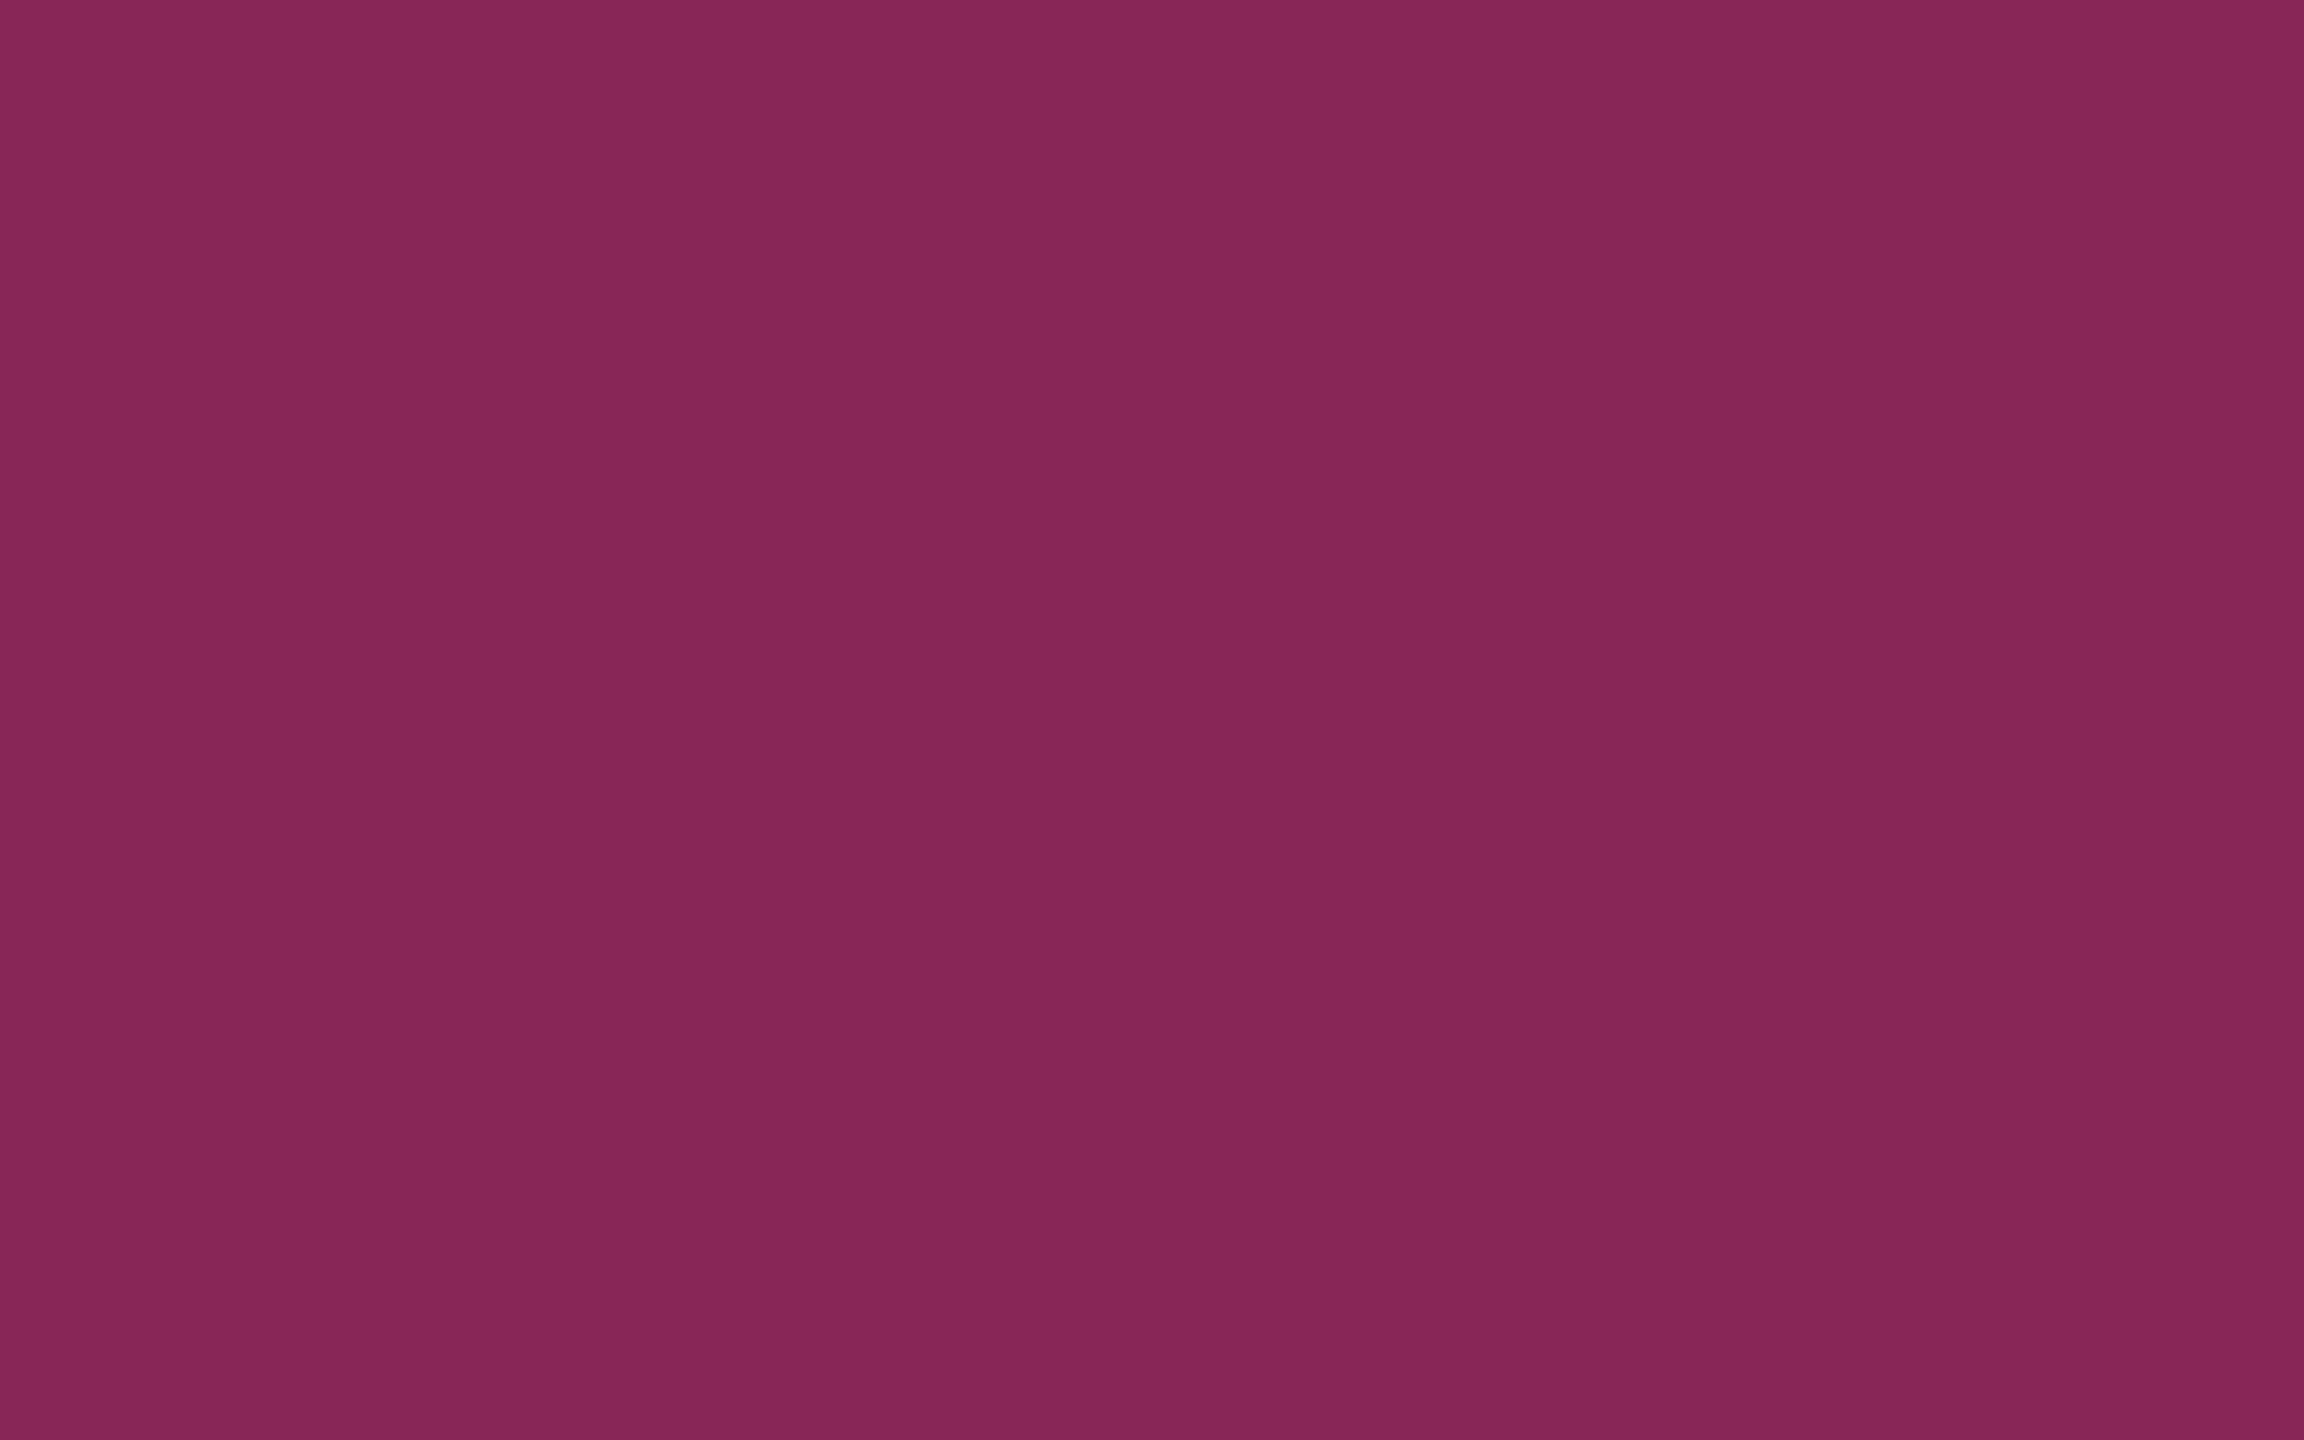 2304x1440 Dark Raspberry Solid Color Background